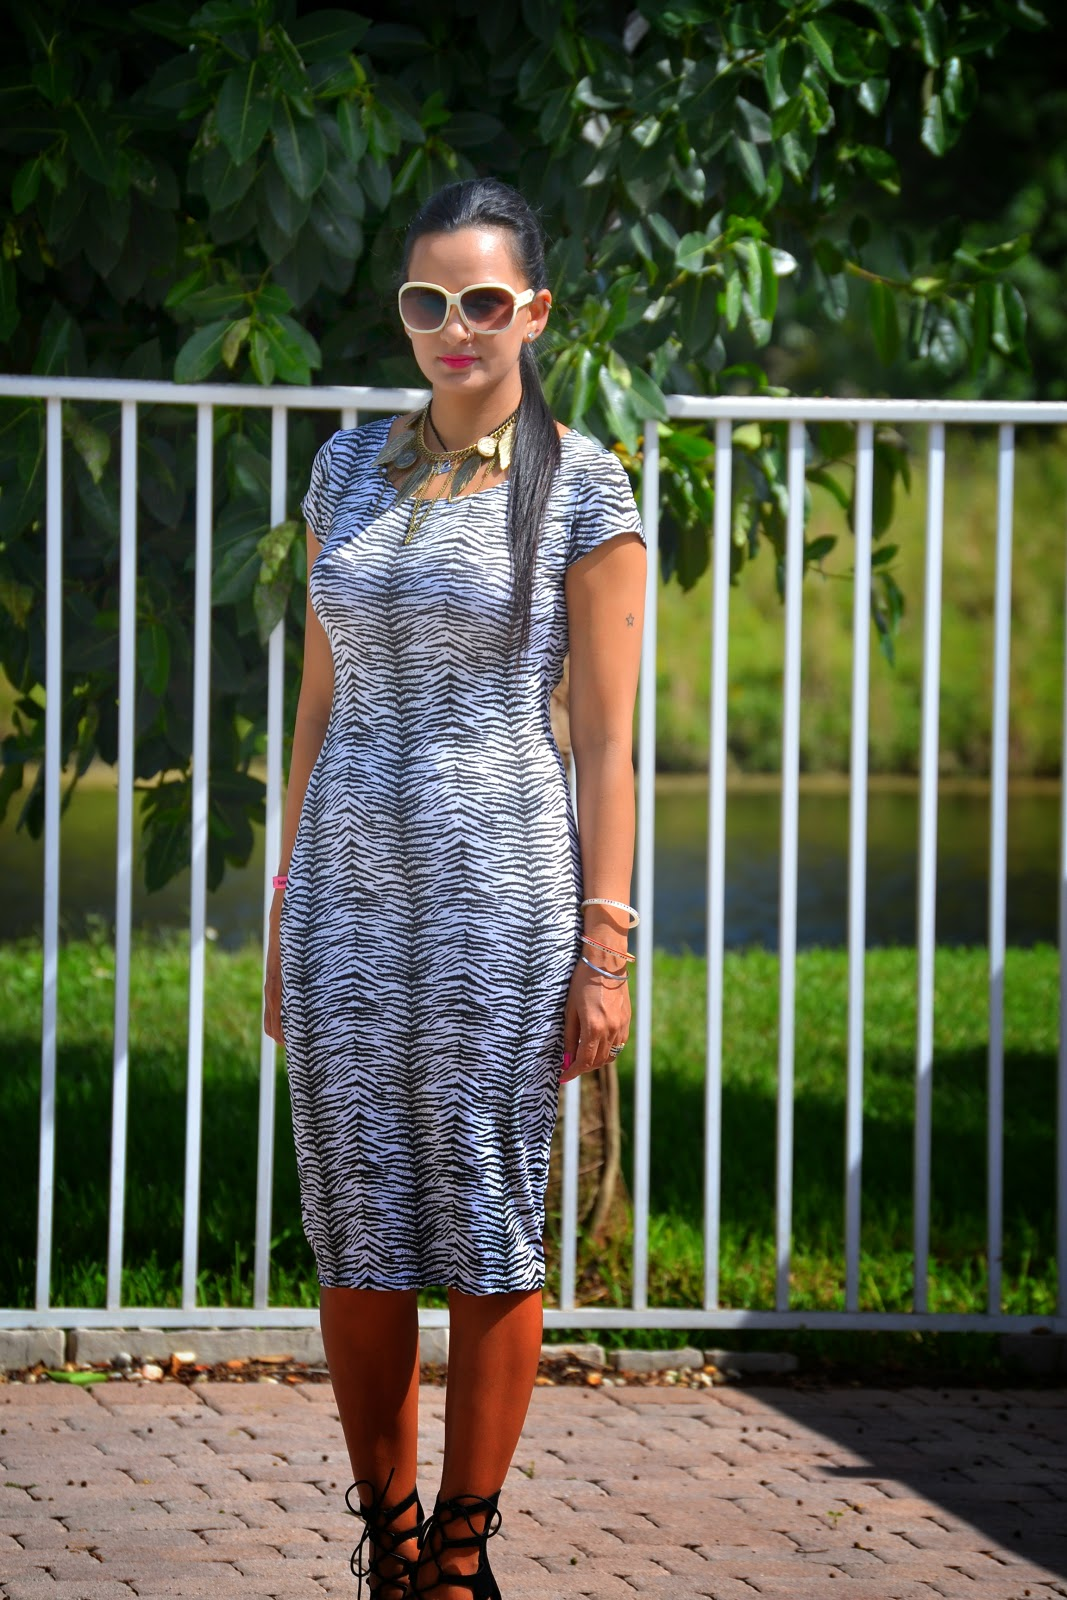 dresses party dresses zebra print dress shoes online cheap shoes www.sandysandhu.co